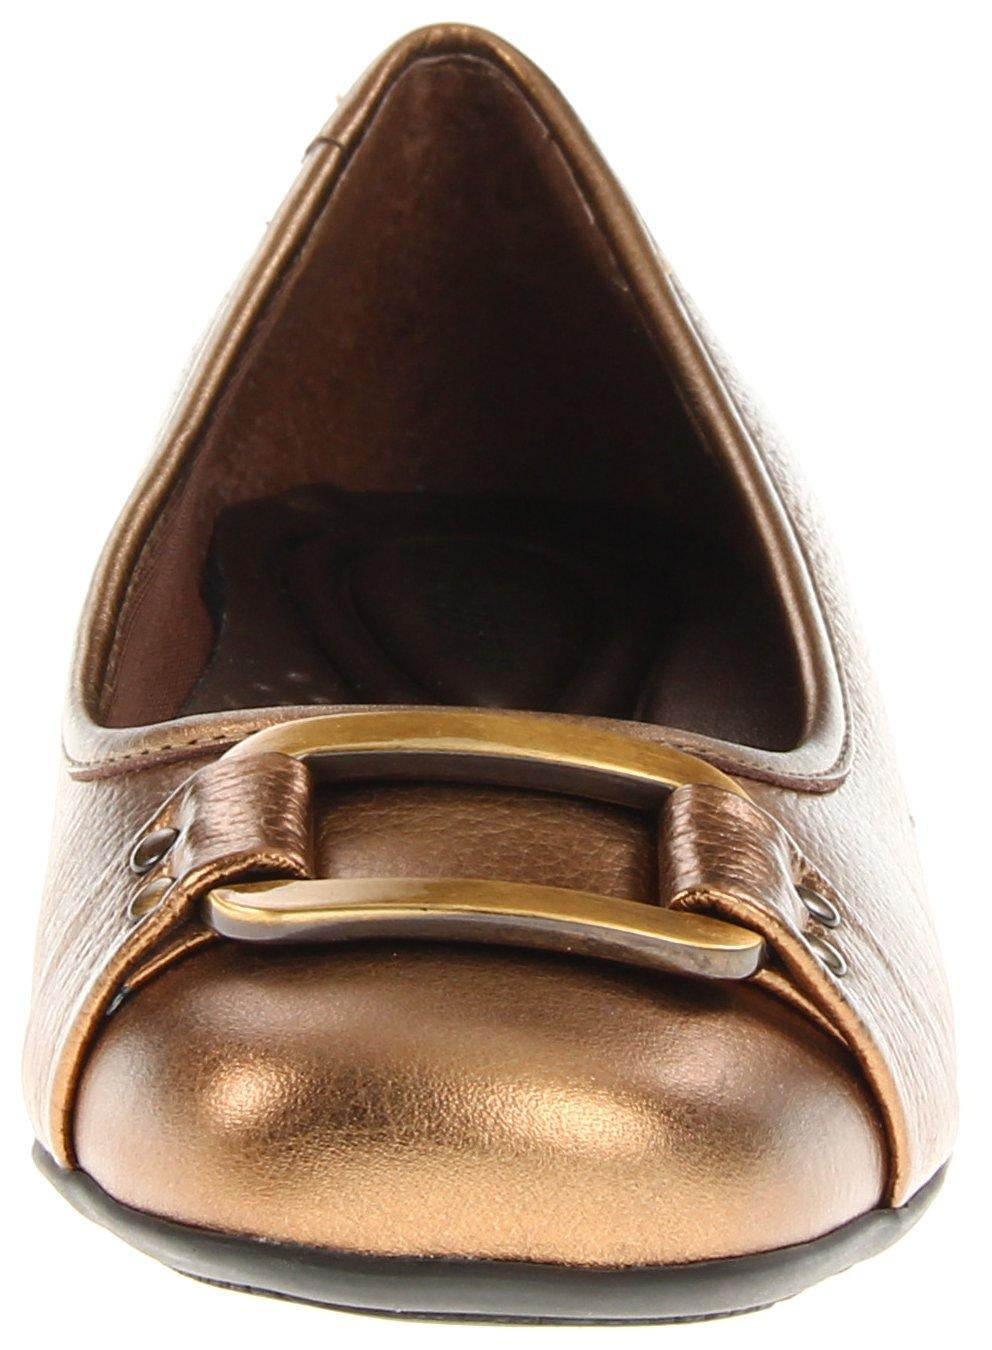 Trotters Women's Sizzle Signature W Ballet Flat B0073E65UA 6 W Signature US|Bronze 6d0817